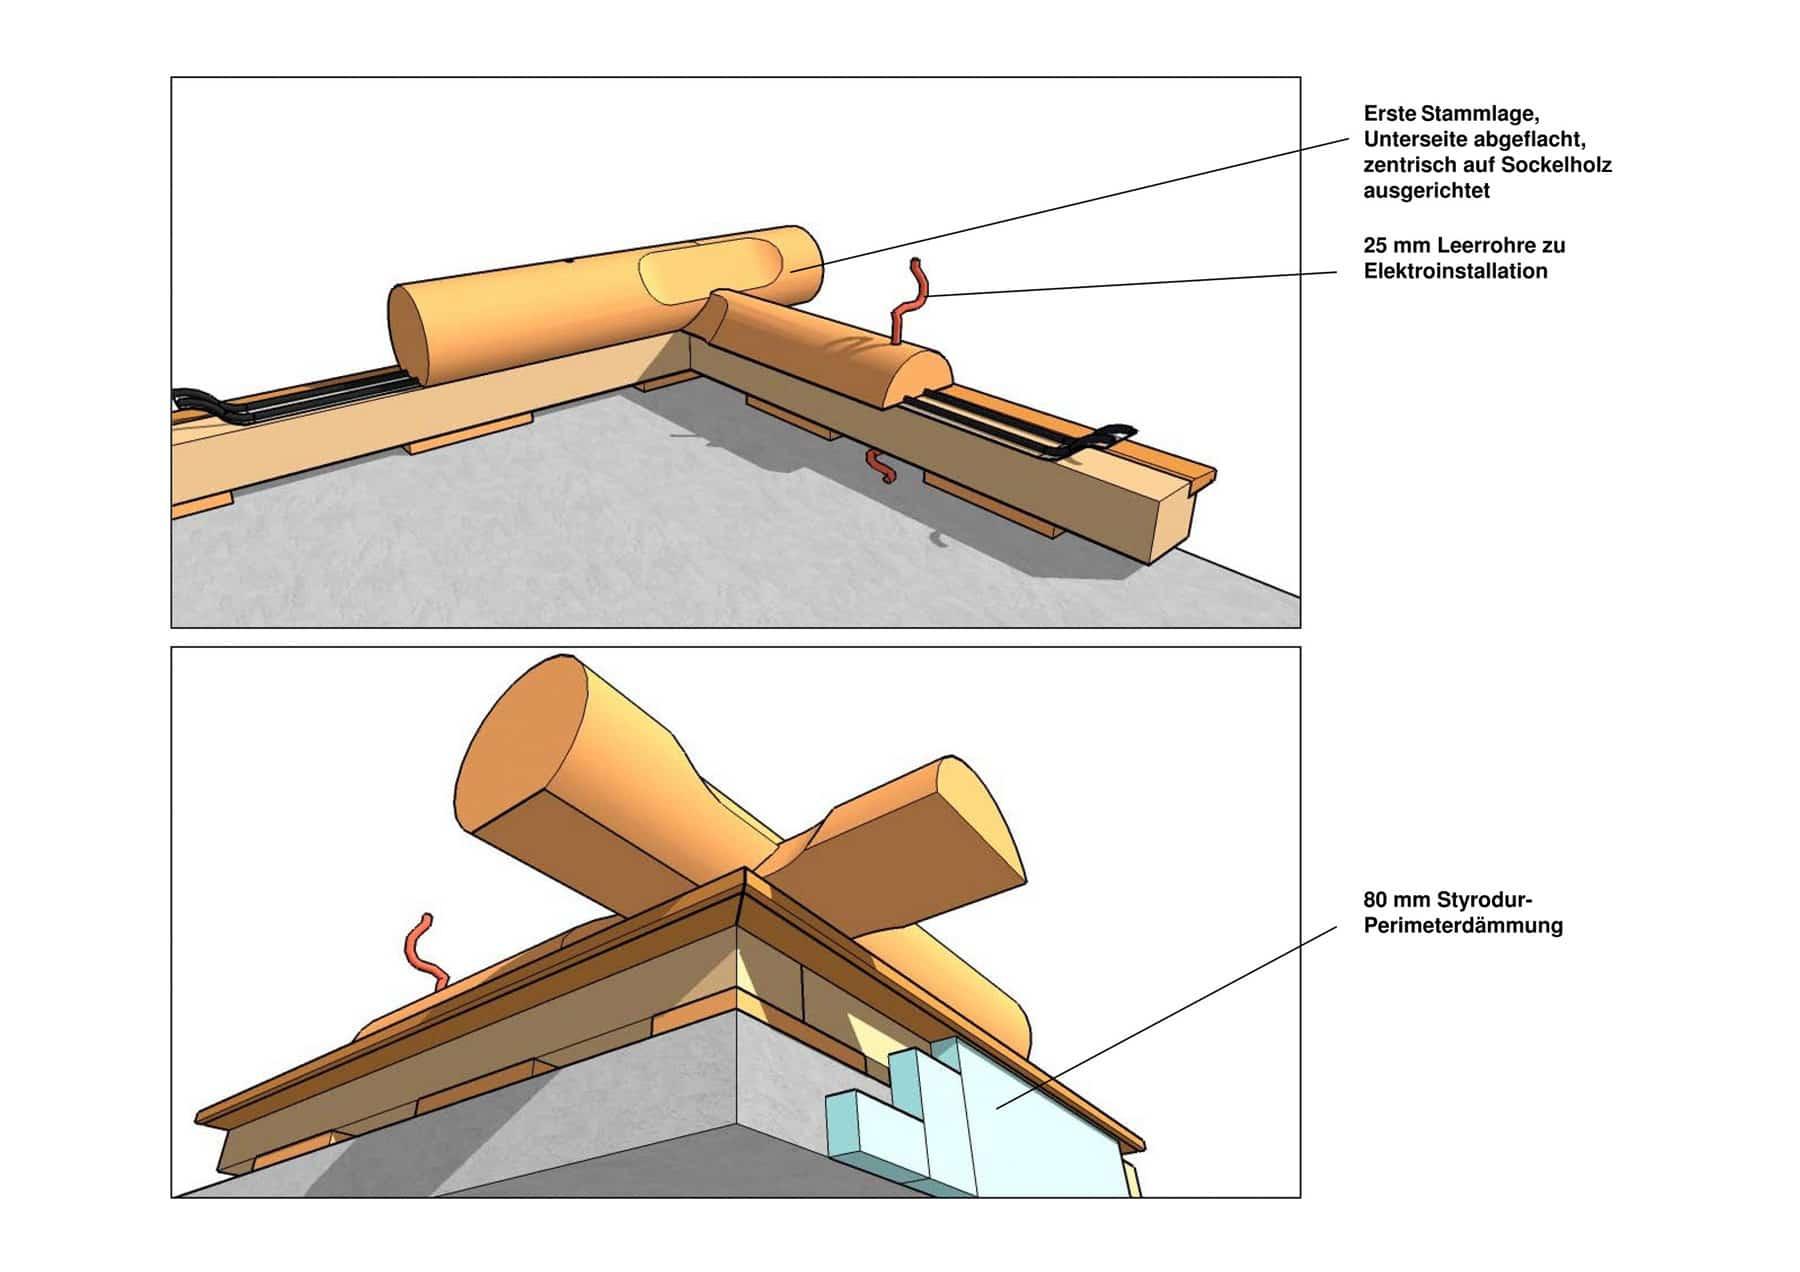 anschl sse details team kanadablockhaus gmbh. Black Bedroom Furniture Sets. Home Design Ideas